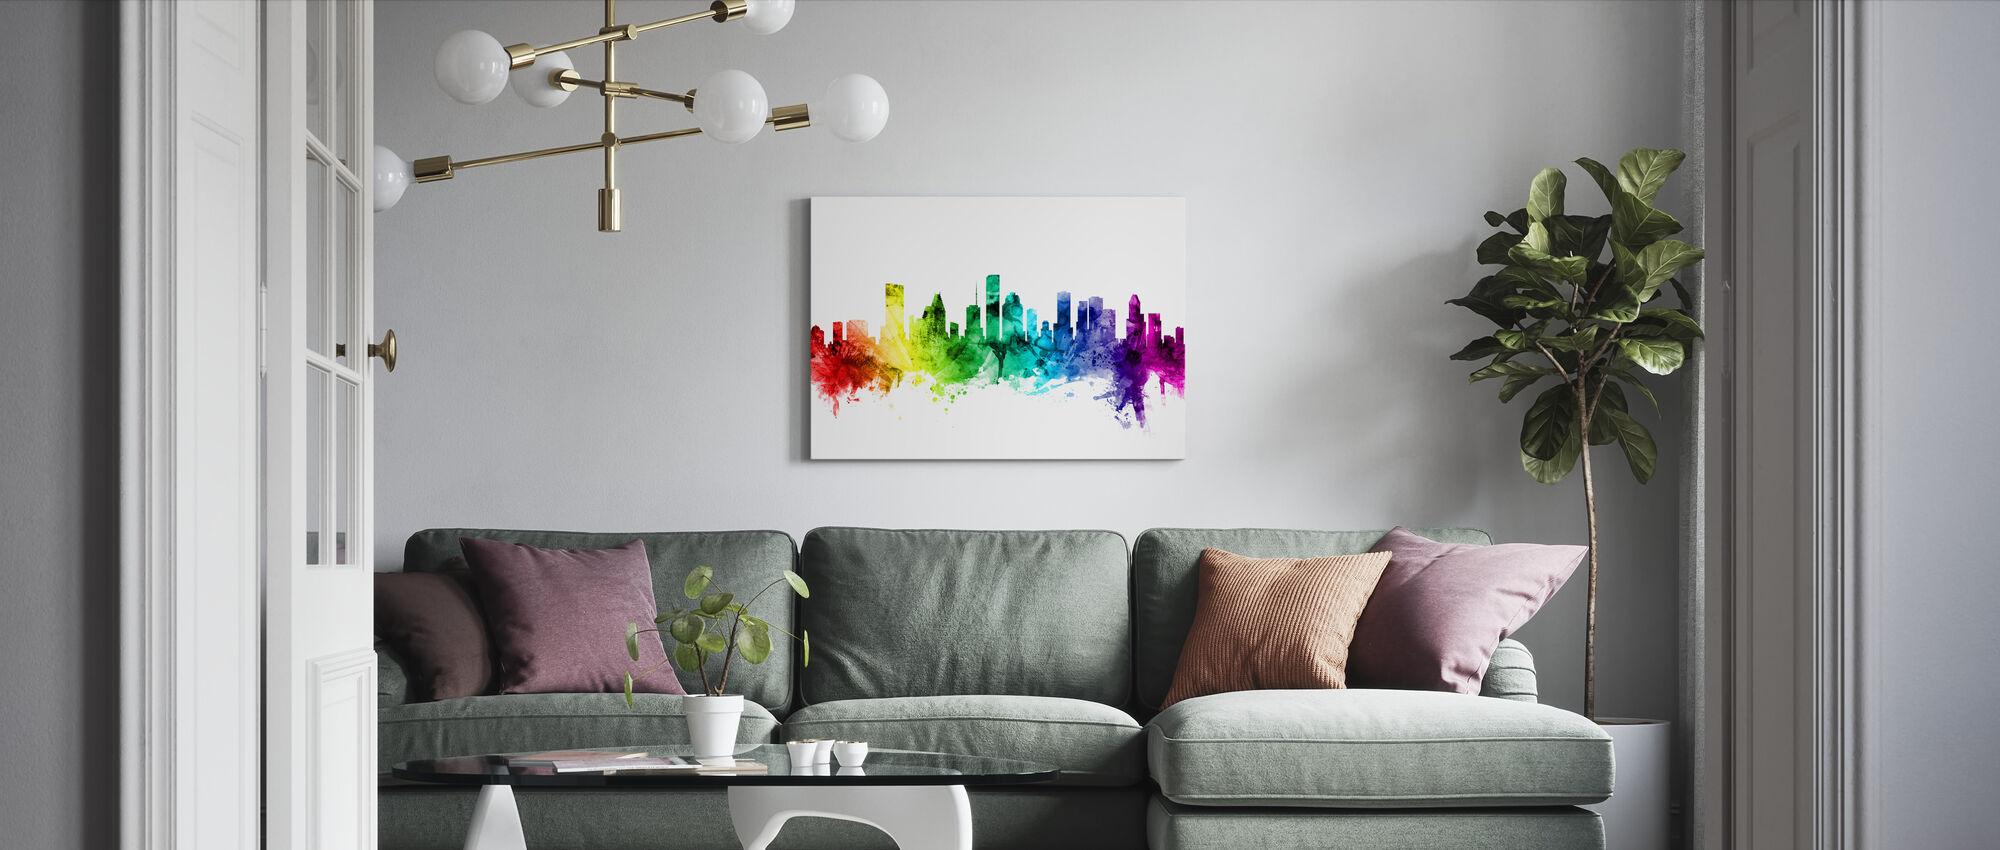 Houston Texas Skyline Rainbow - Canvas print - Living Room